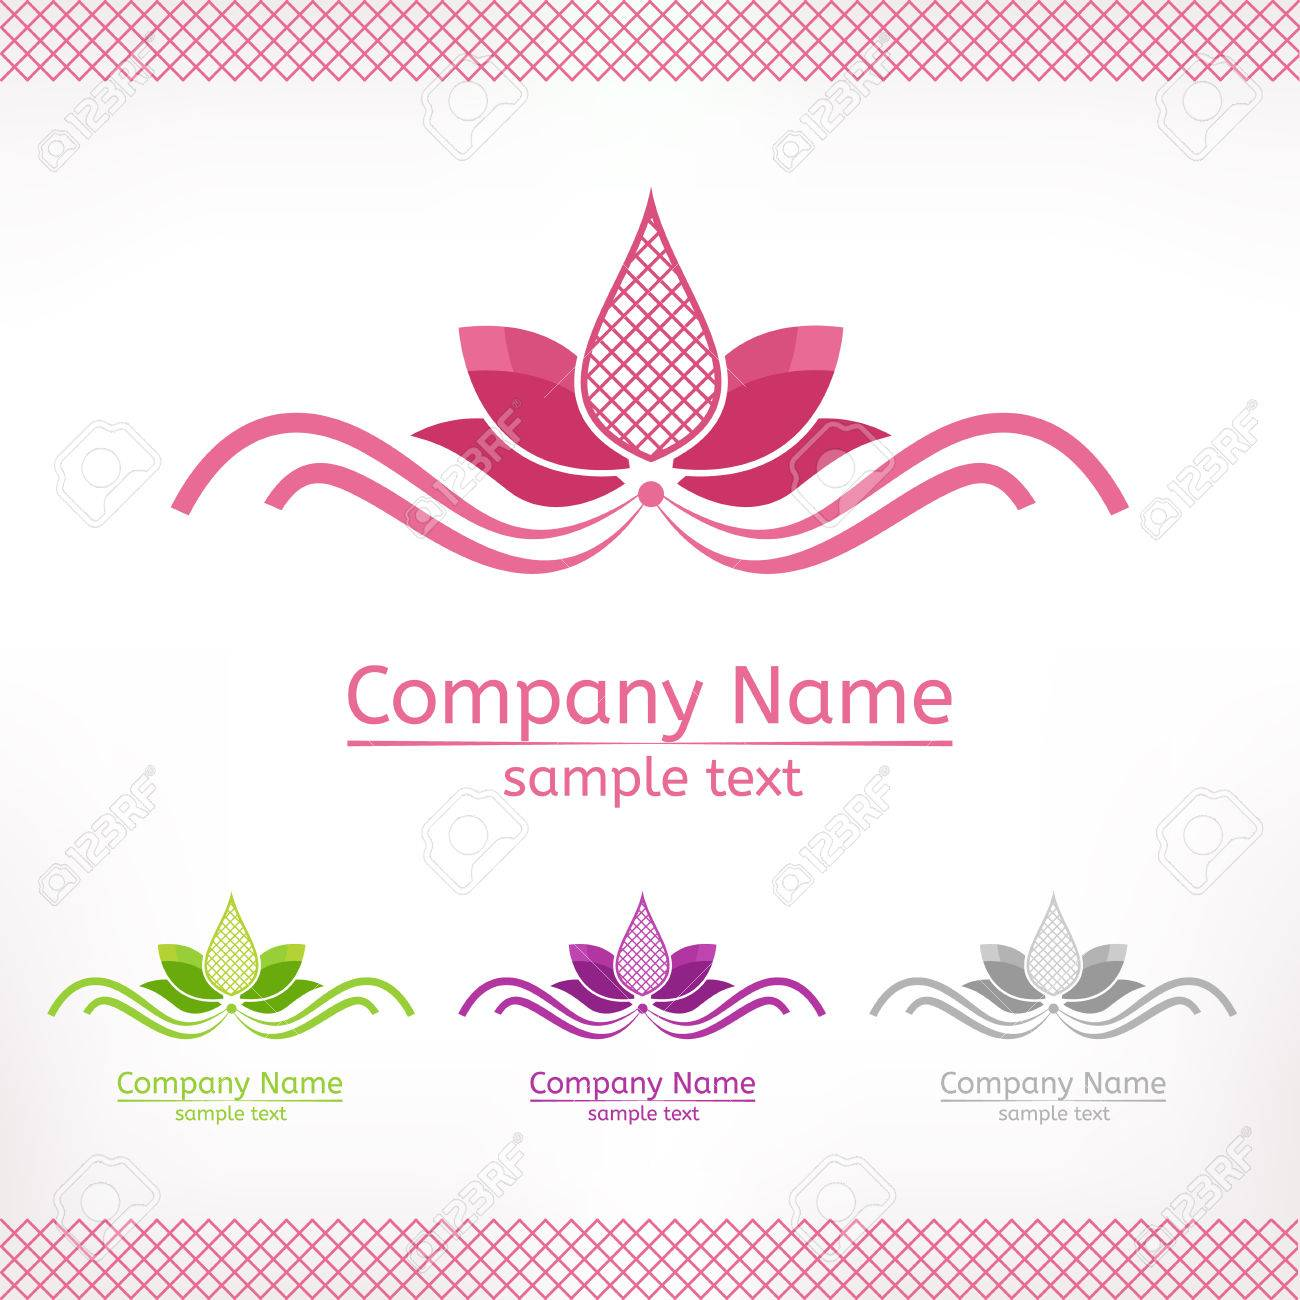 stylized pink lotus flower template logo design in green purple